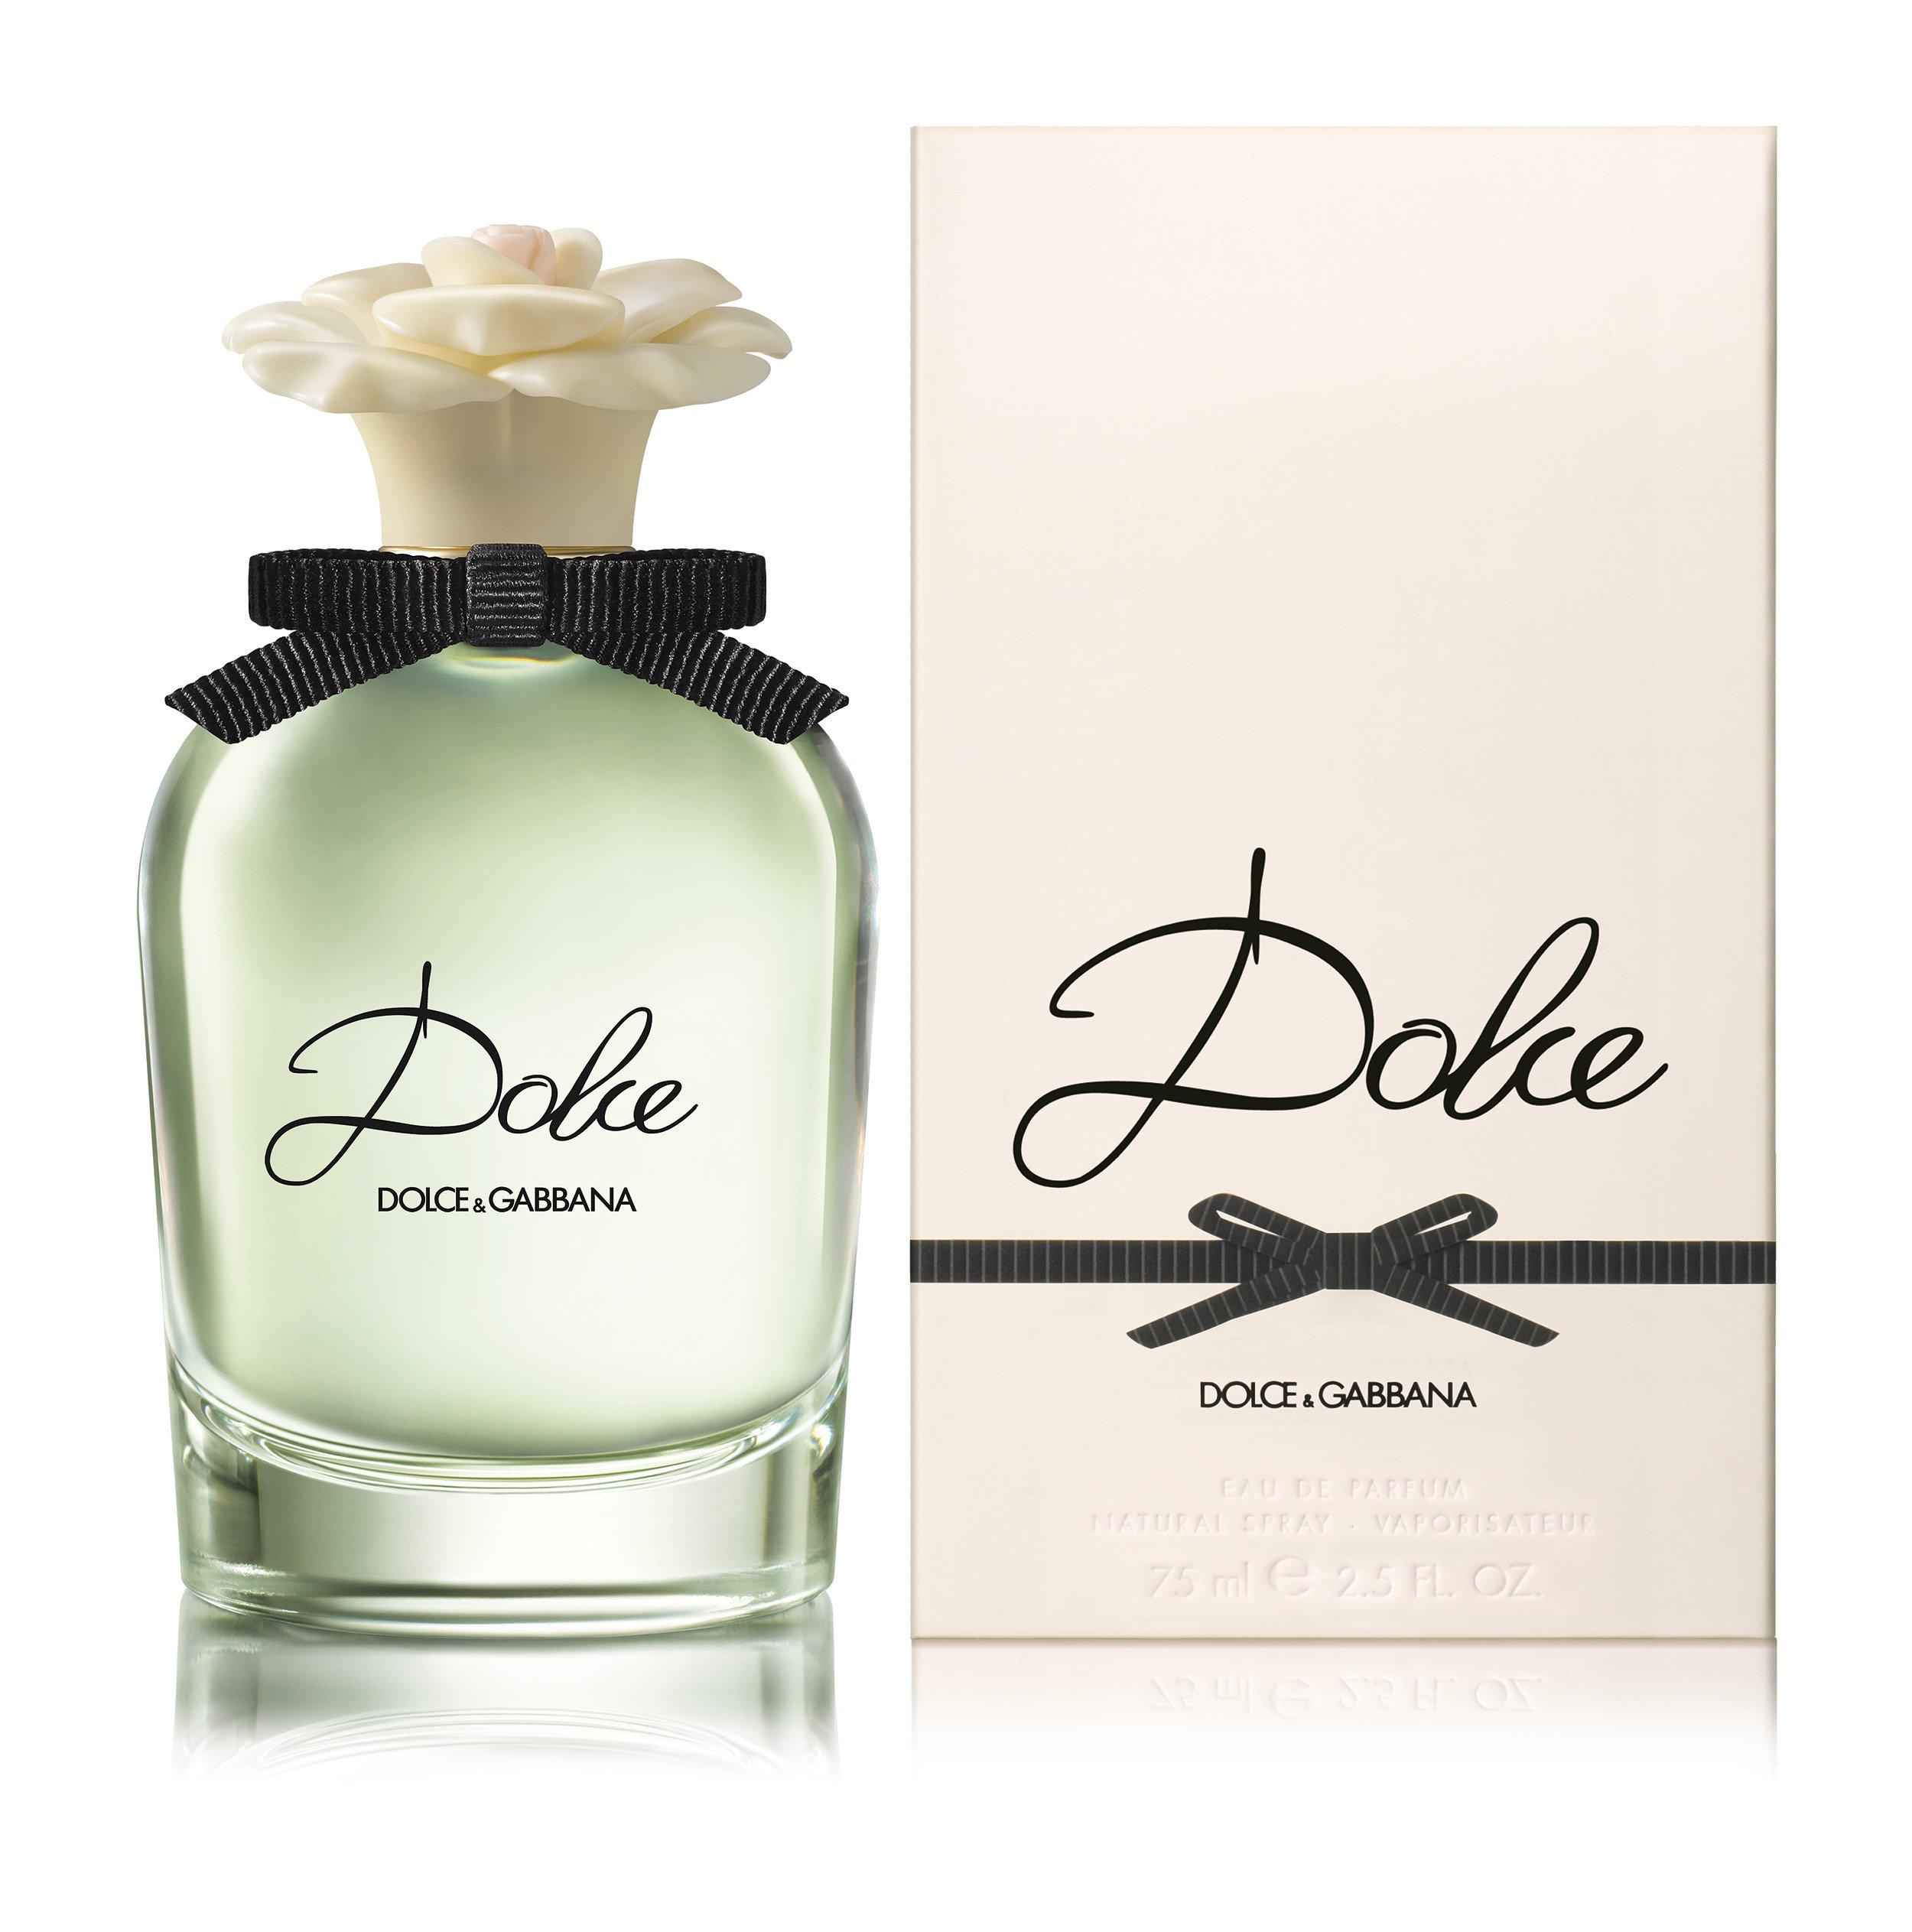 dolce gabbana by dolce gabbana perfume reviews